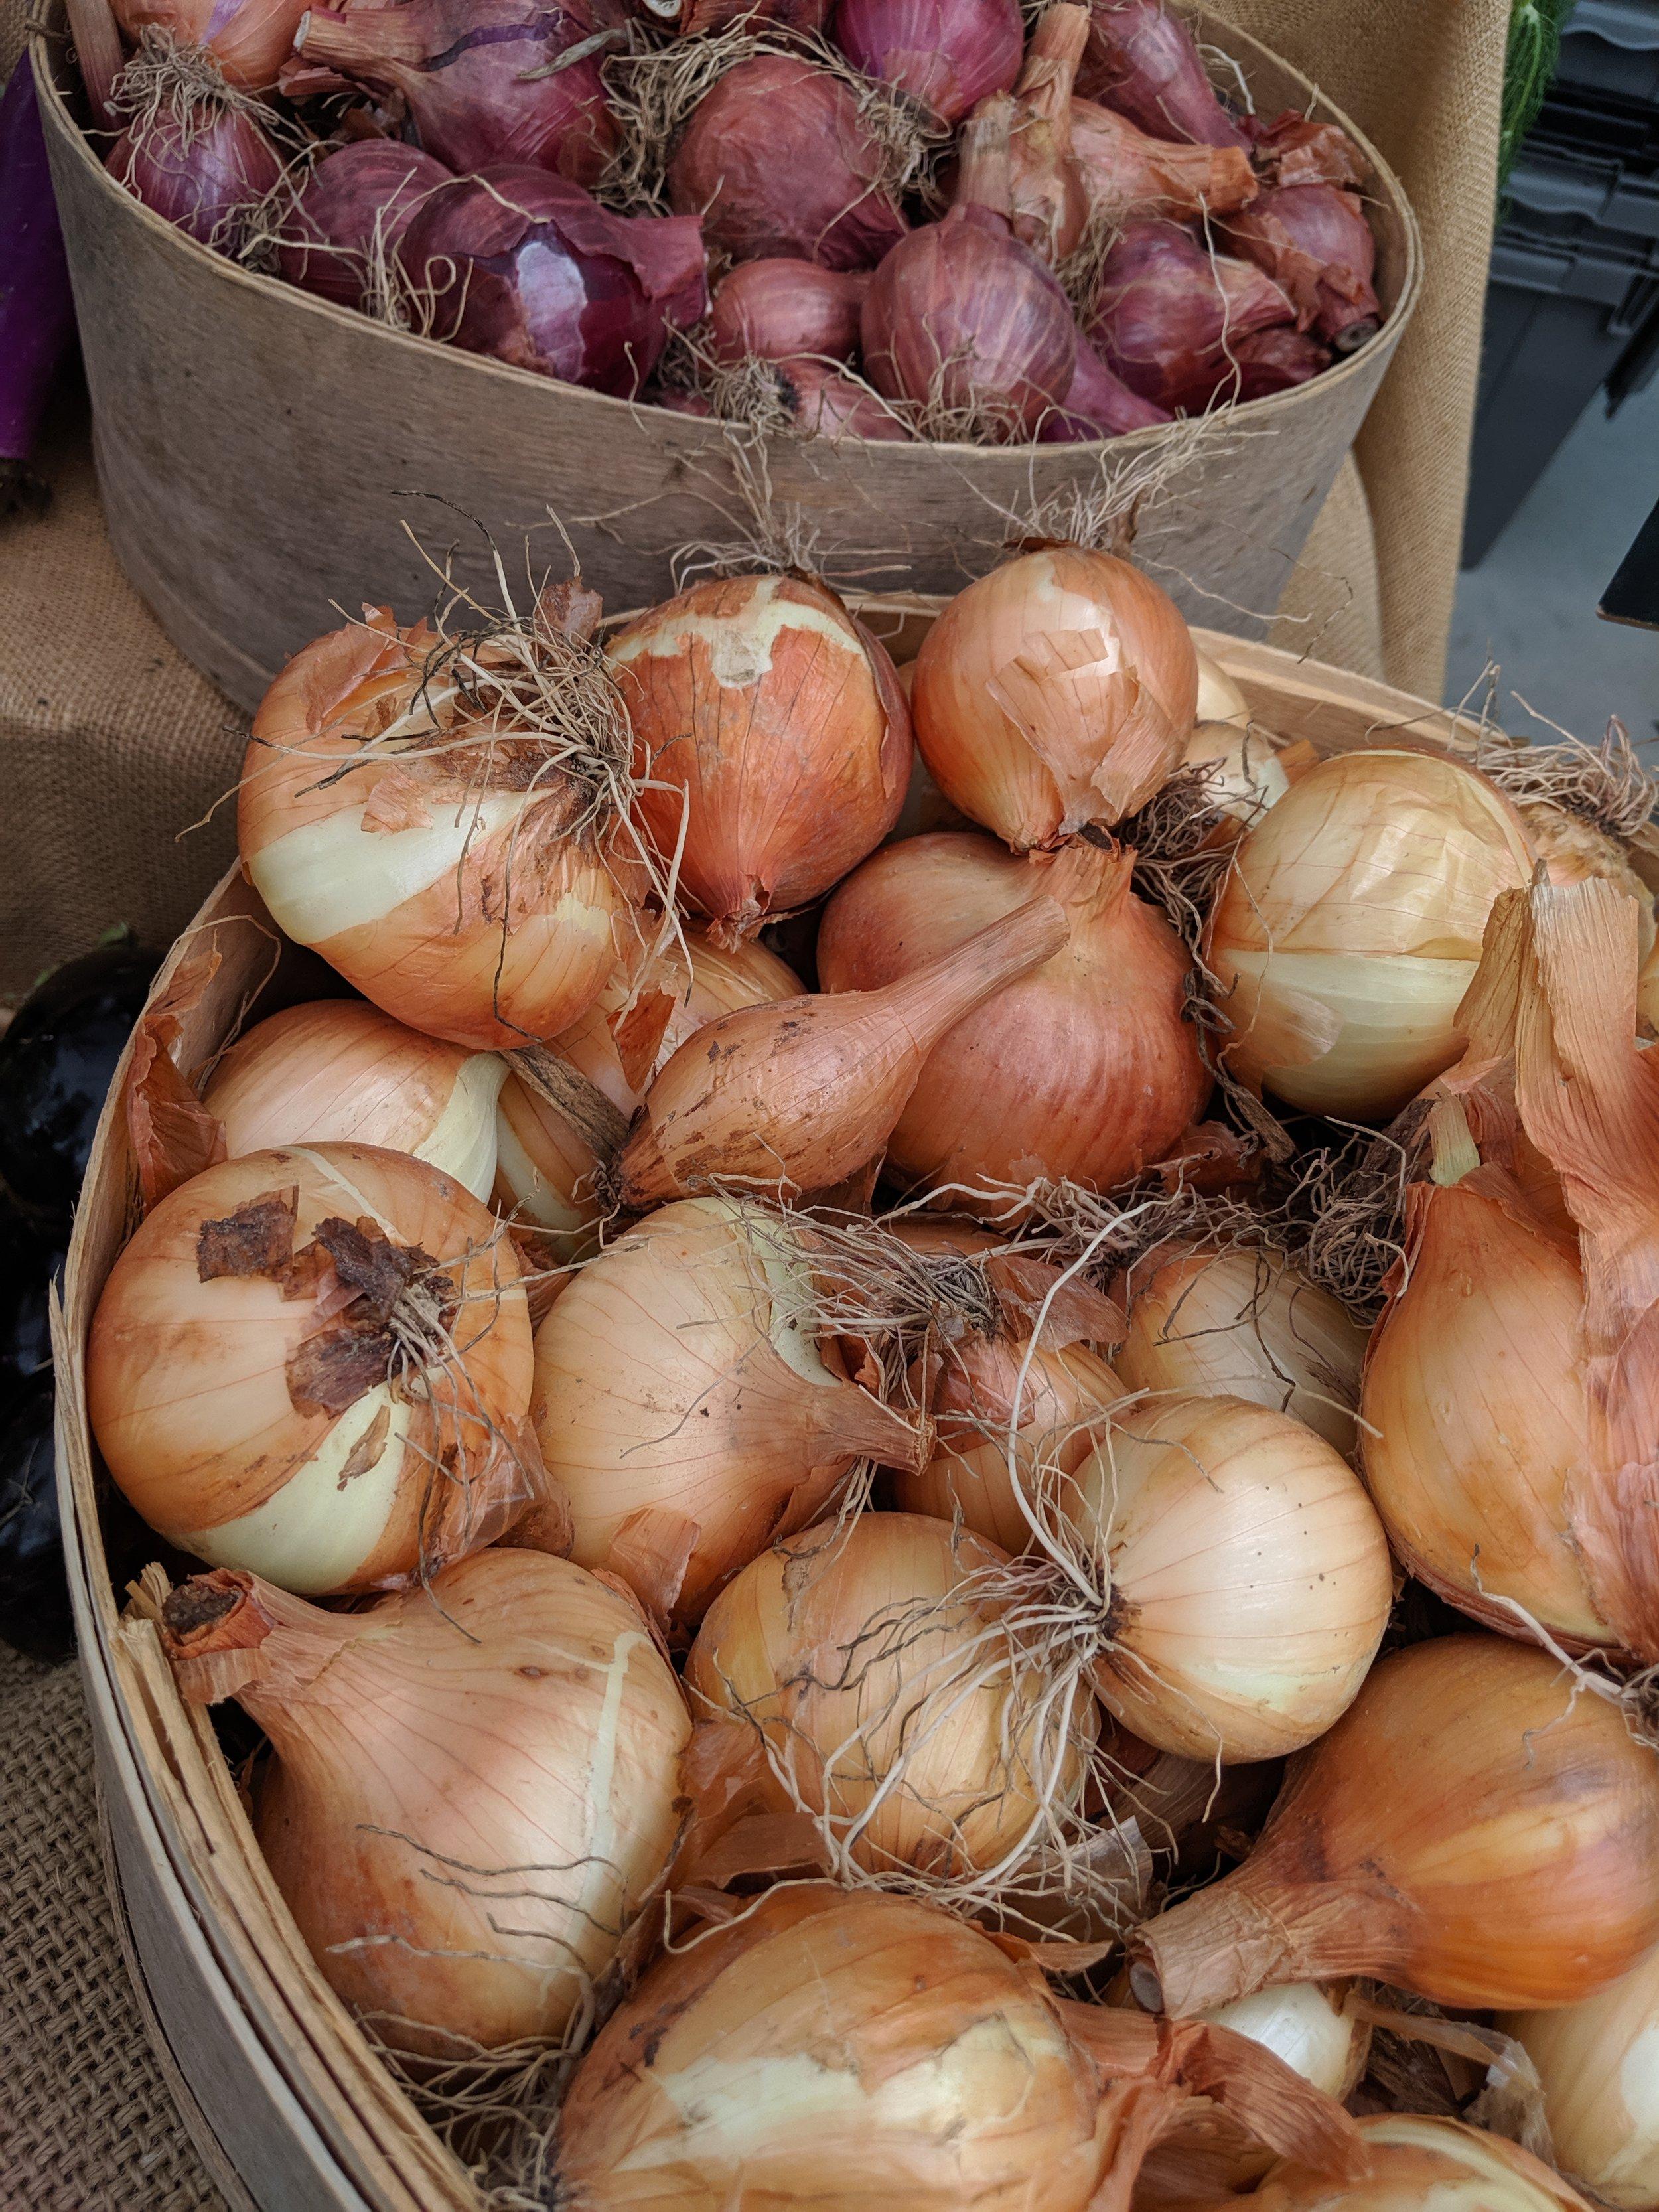 Market Shopping List - 2 yellow onion1 head garlic2 bell pepper2 large Italian eggplant3 pints cherry tomatoes 1 zucchini1 squash2 large tomatoes1 lb okraMango Thai Basil preserves from Piedmont ProvisionsBasil, thyme, rosemary, oregano (if available)